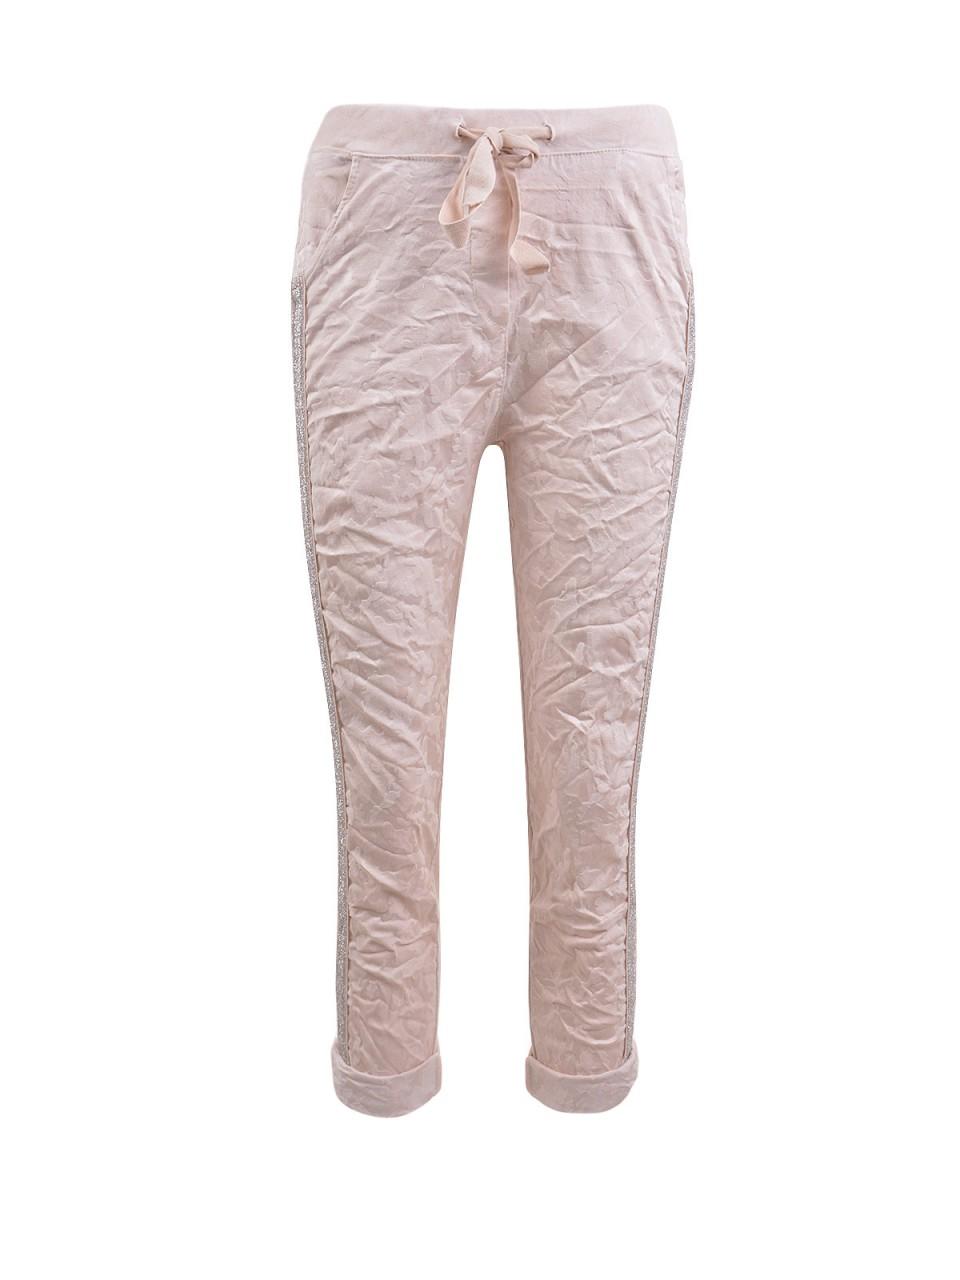 Hosen für Frauen - C M PREMIUM Damen Hose, rosa  - Onlineshop Designermode.com